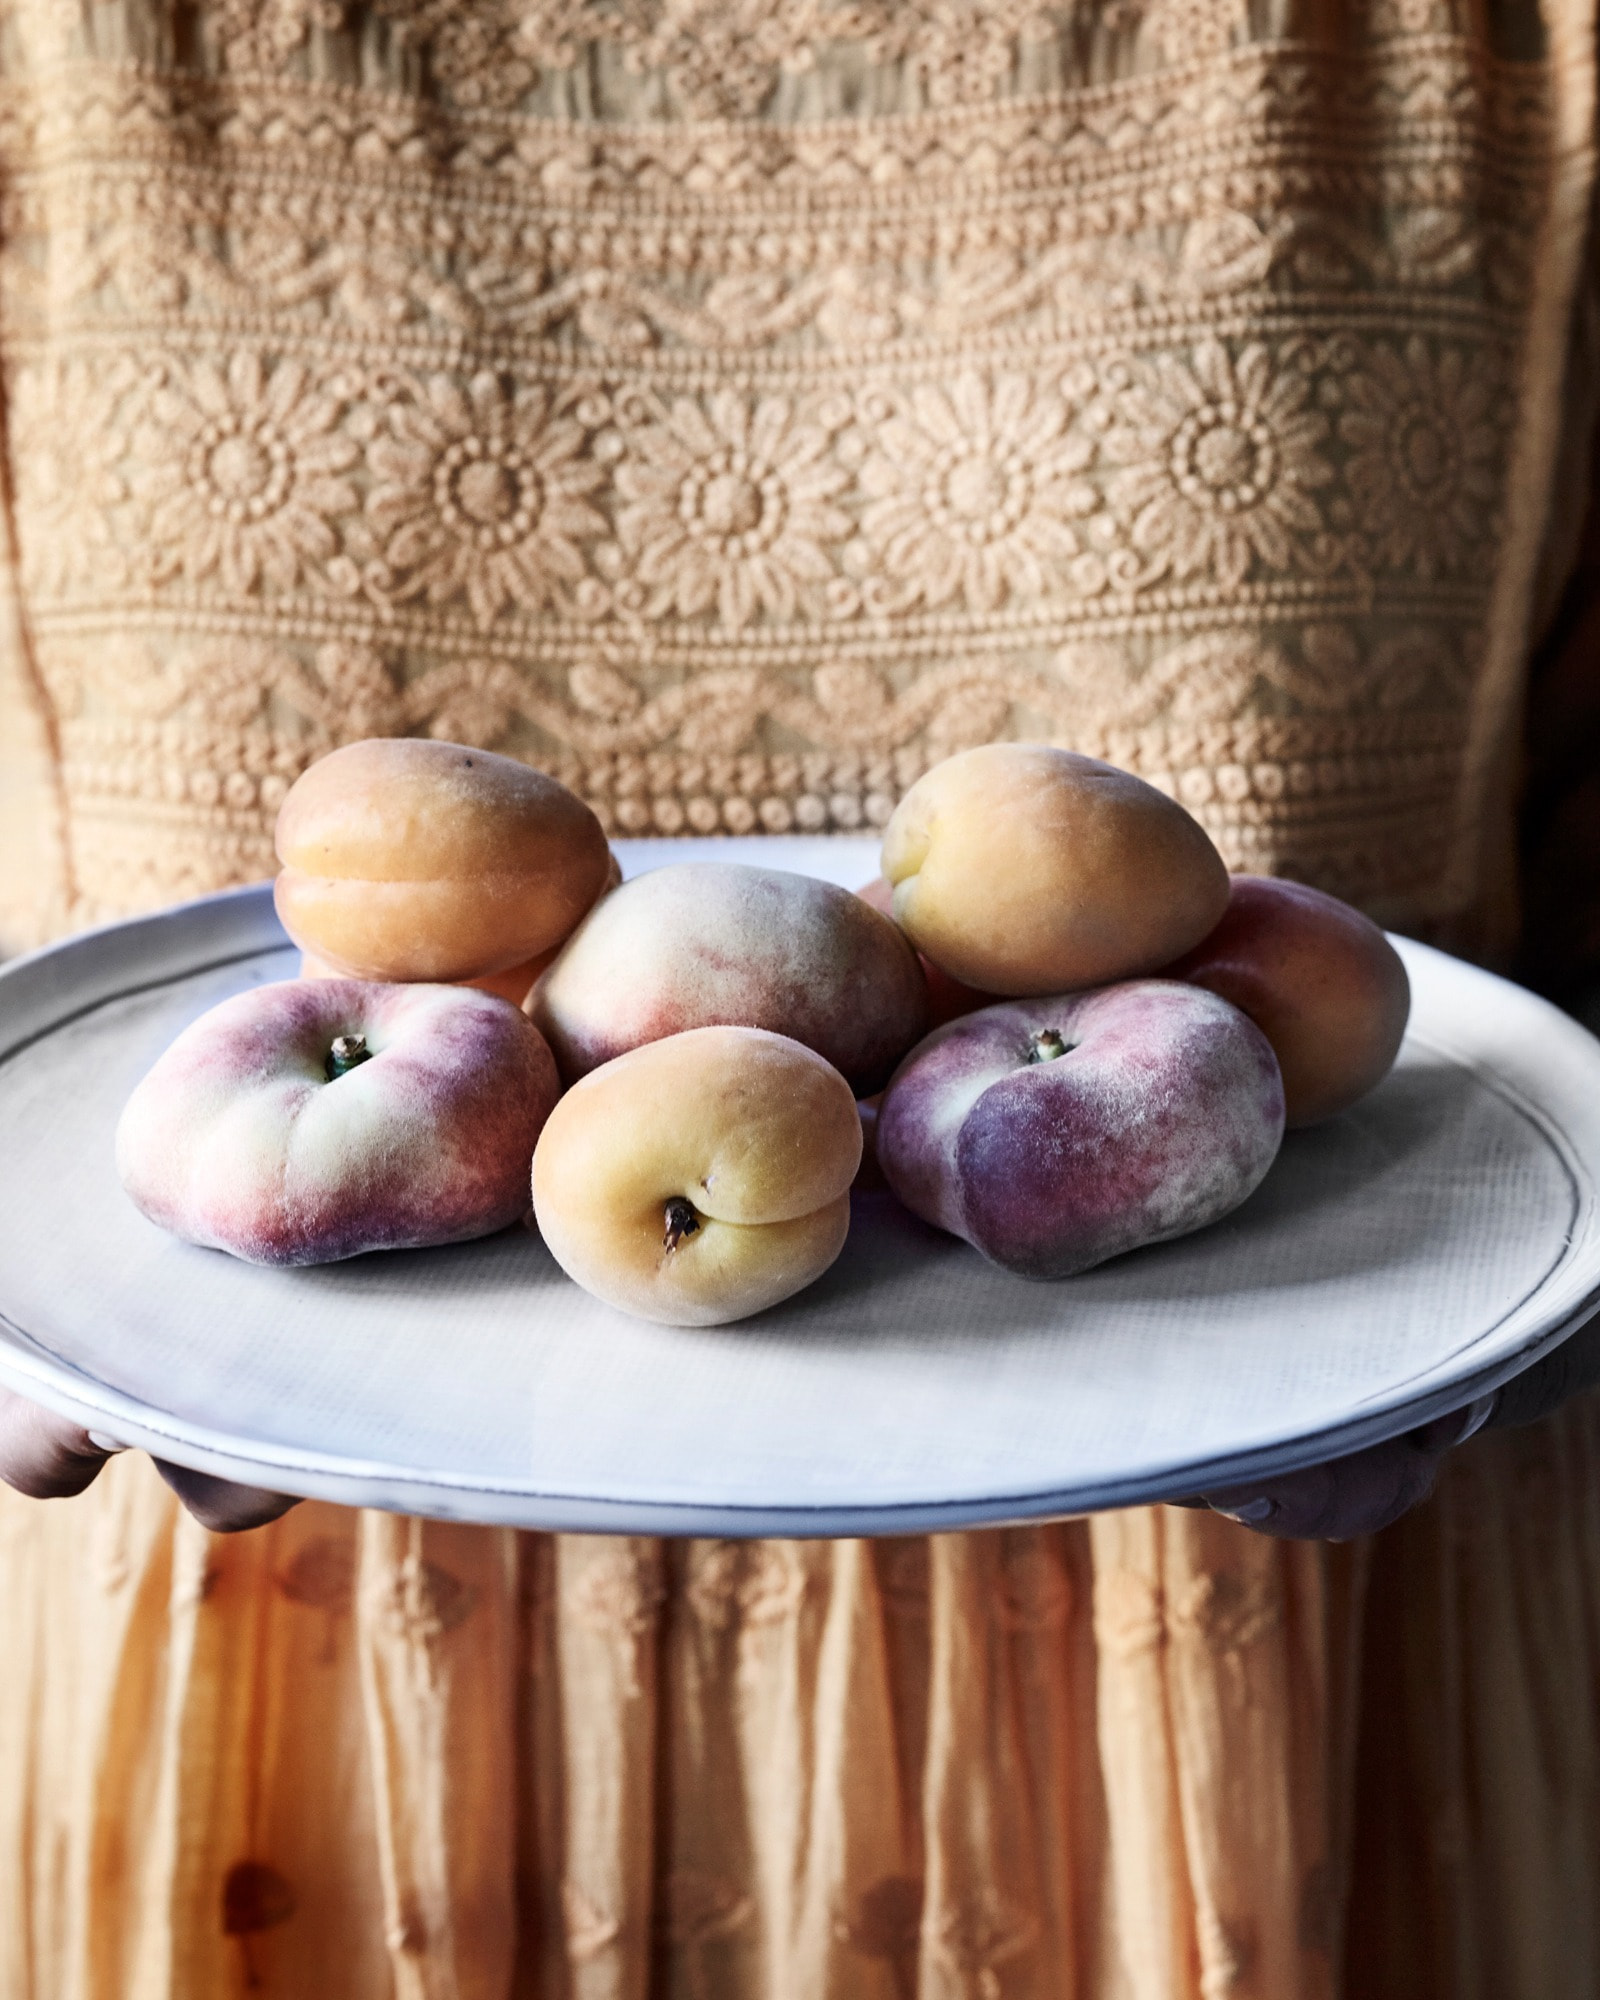 Still life photography, European plum, Apple, Fruit, Food